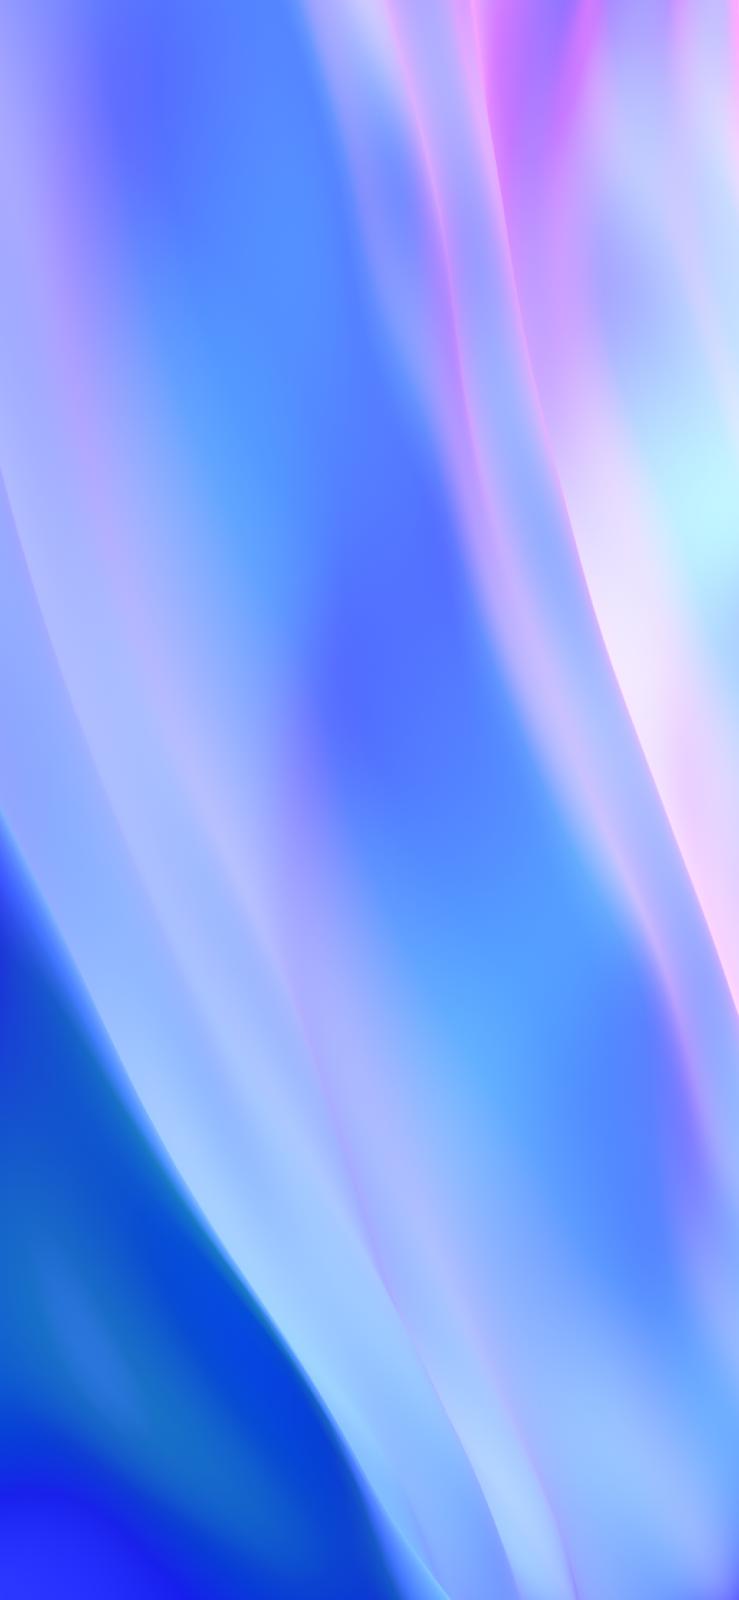 iPhone X 高解析度幾何幻想桌布下載